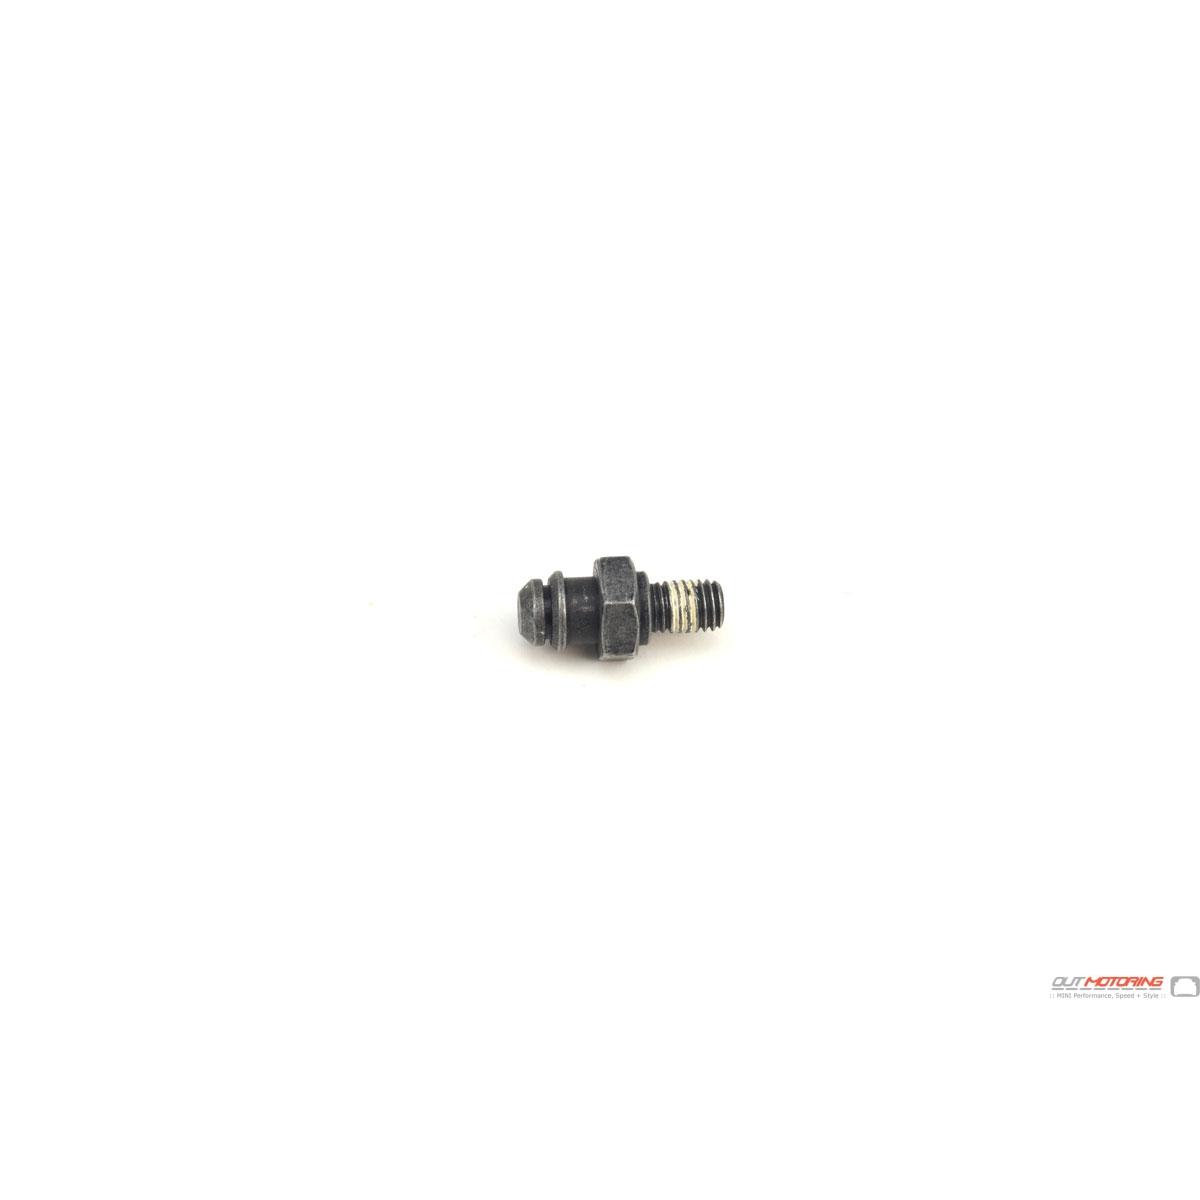 54347149680 MINI Cooper Replacement Pin: Convertible Top